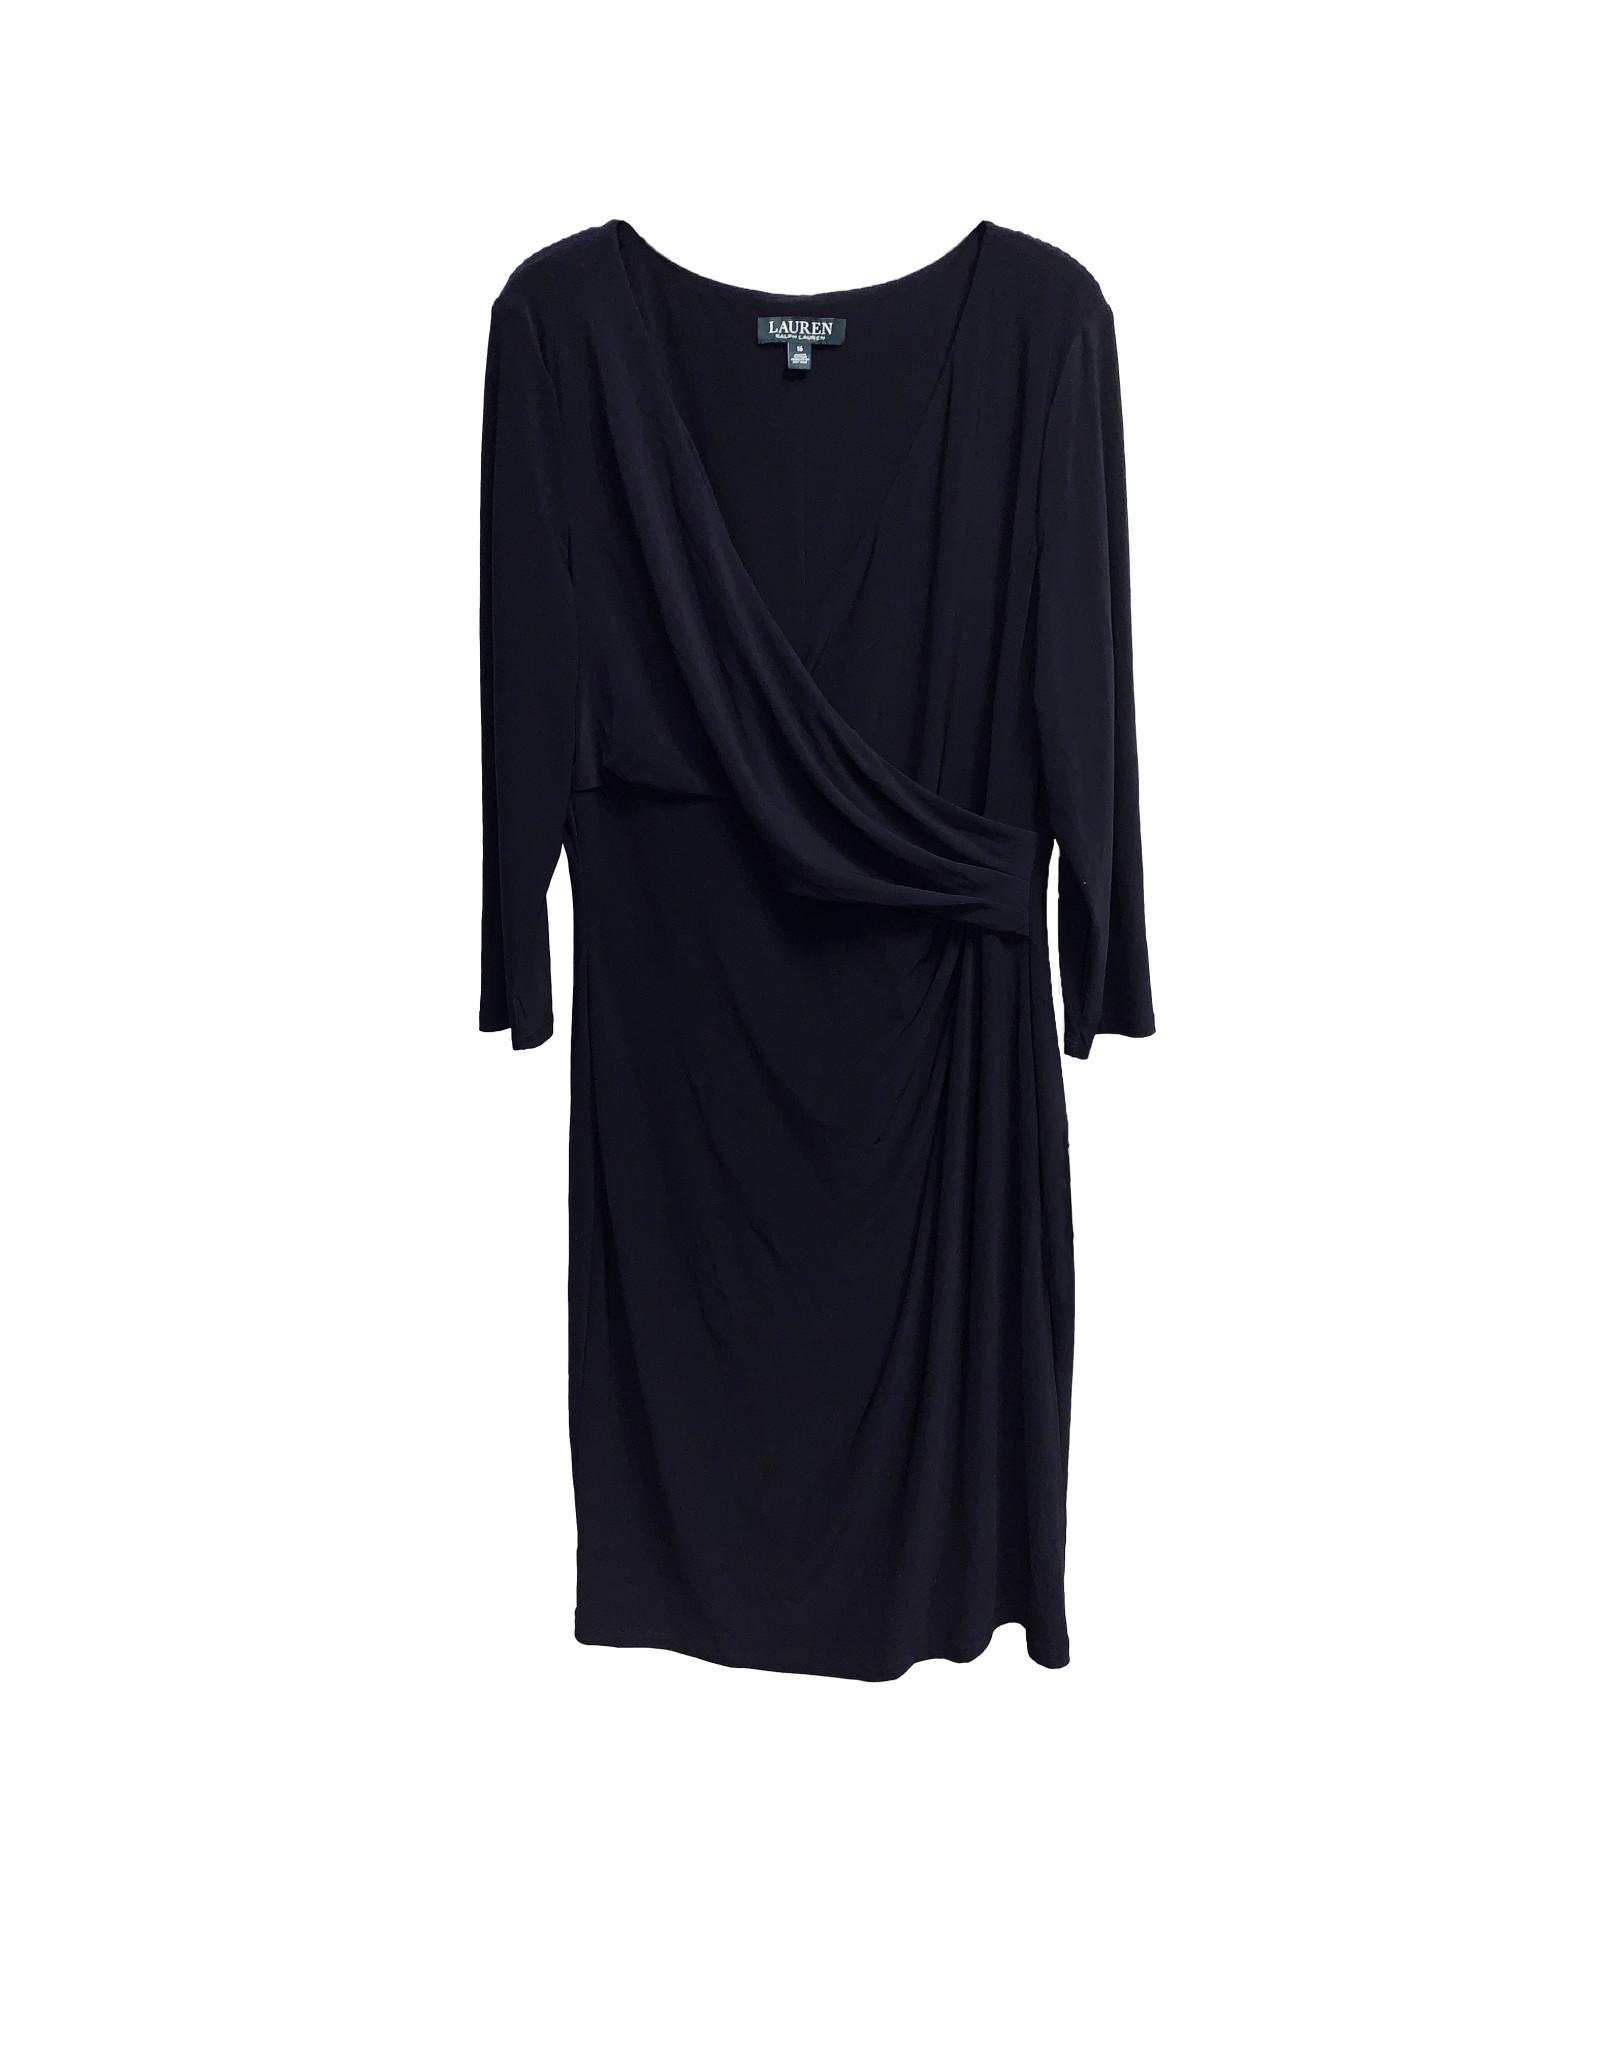 LAUREN RALPH LAUREN LAUREN RALPH LAUREN Elbow Length Sleeve Dress